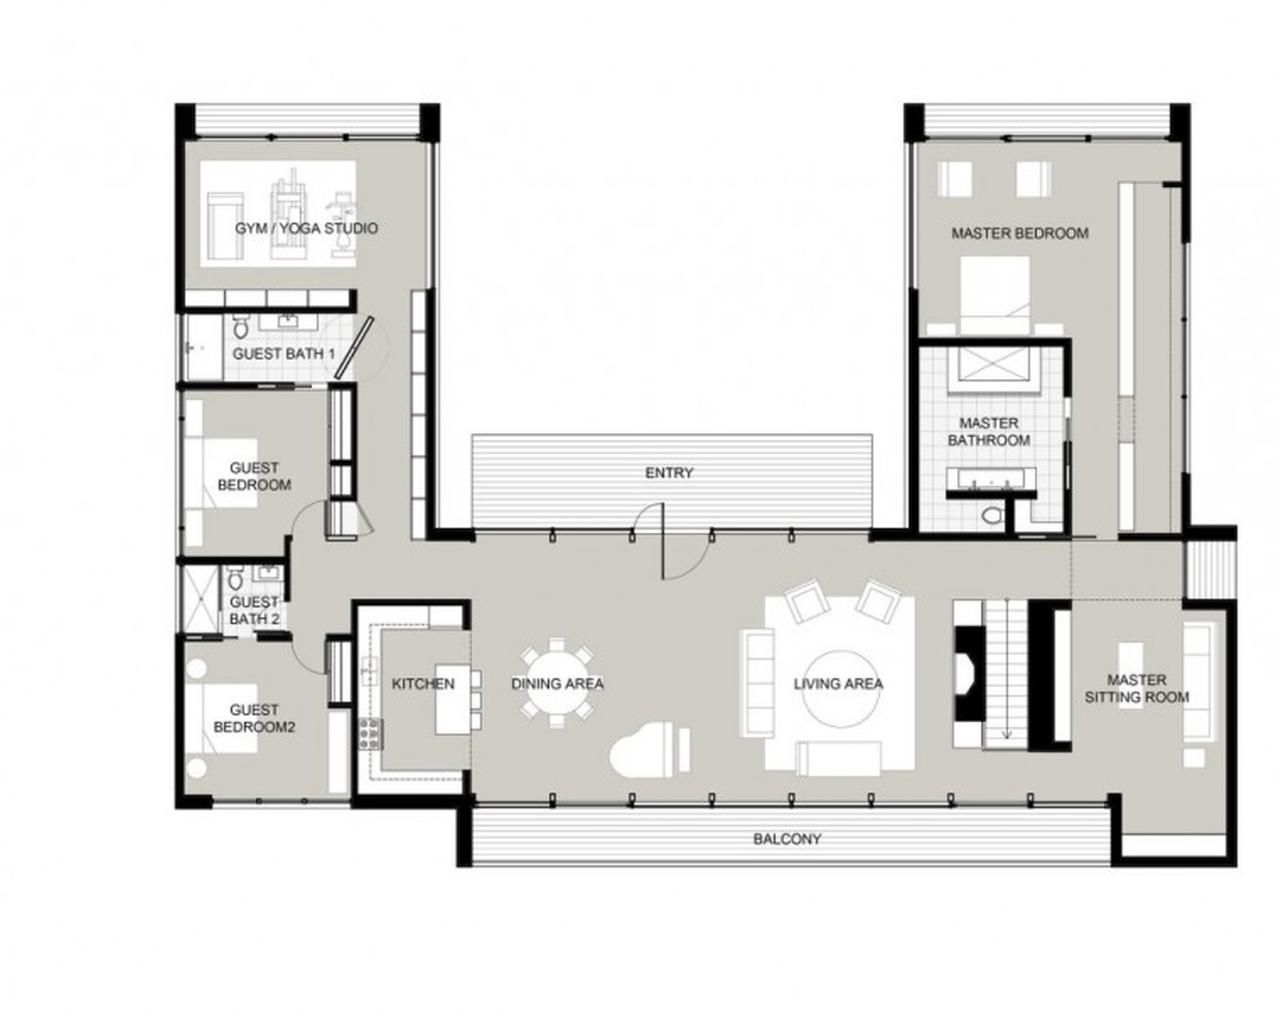 Best 25 u shaped house plans ideas on pinterest u shaped houses house plans with courtyard and 5 bedroom house plans